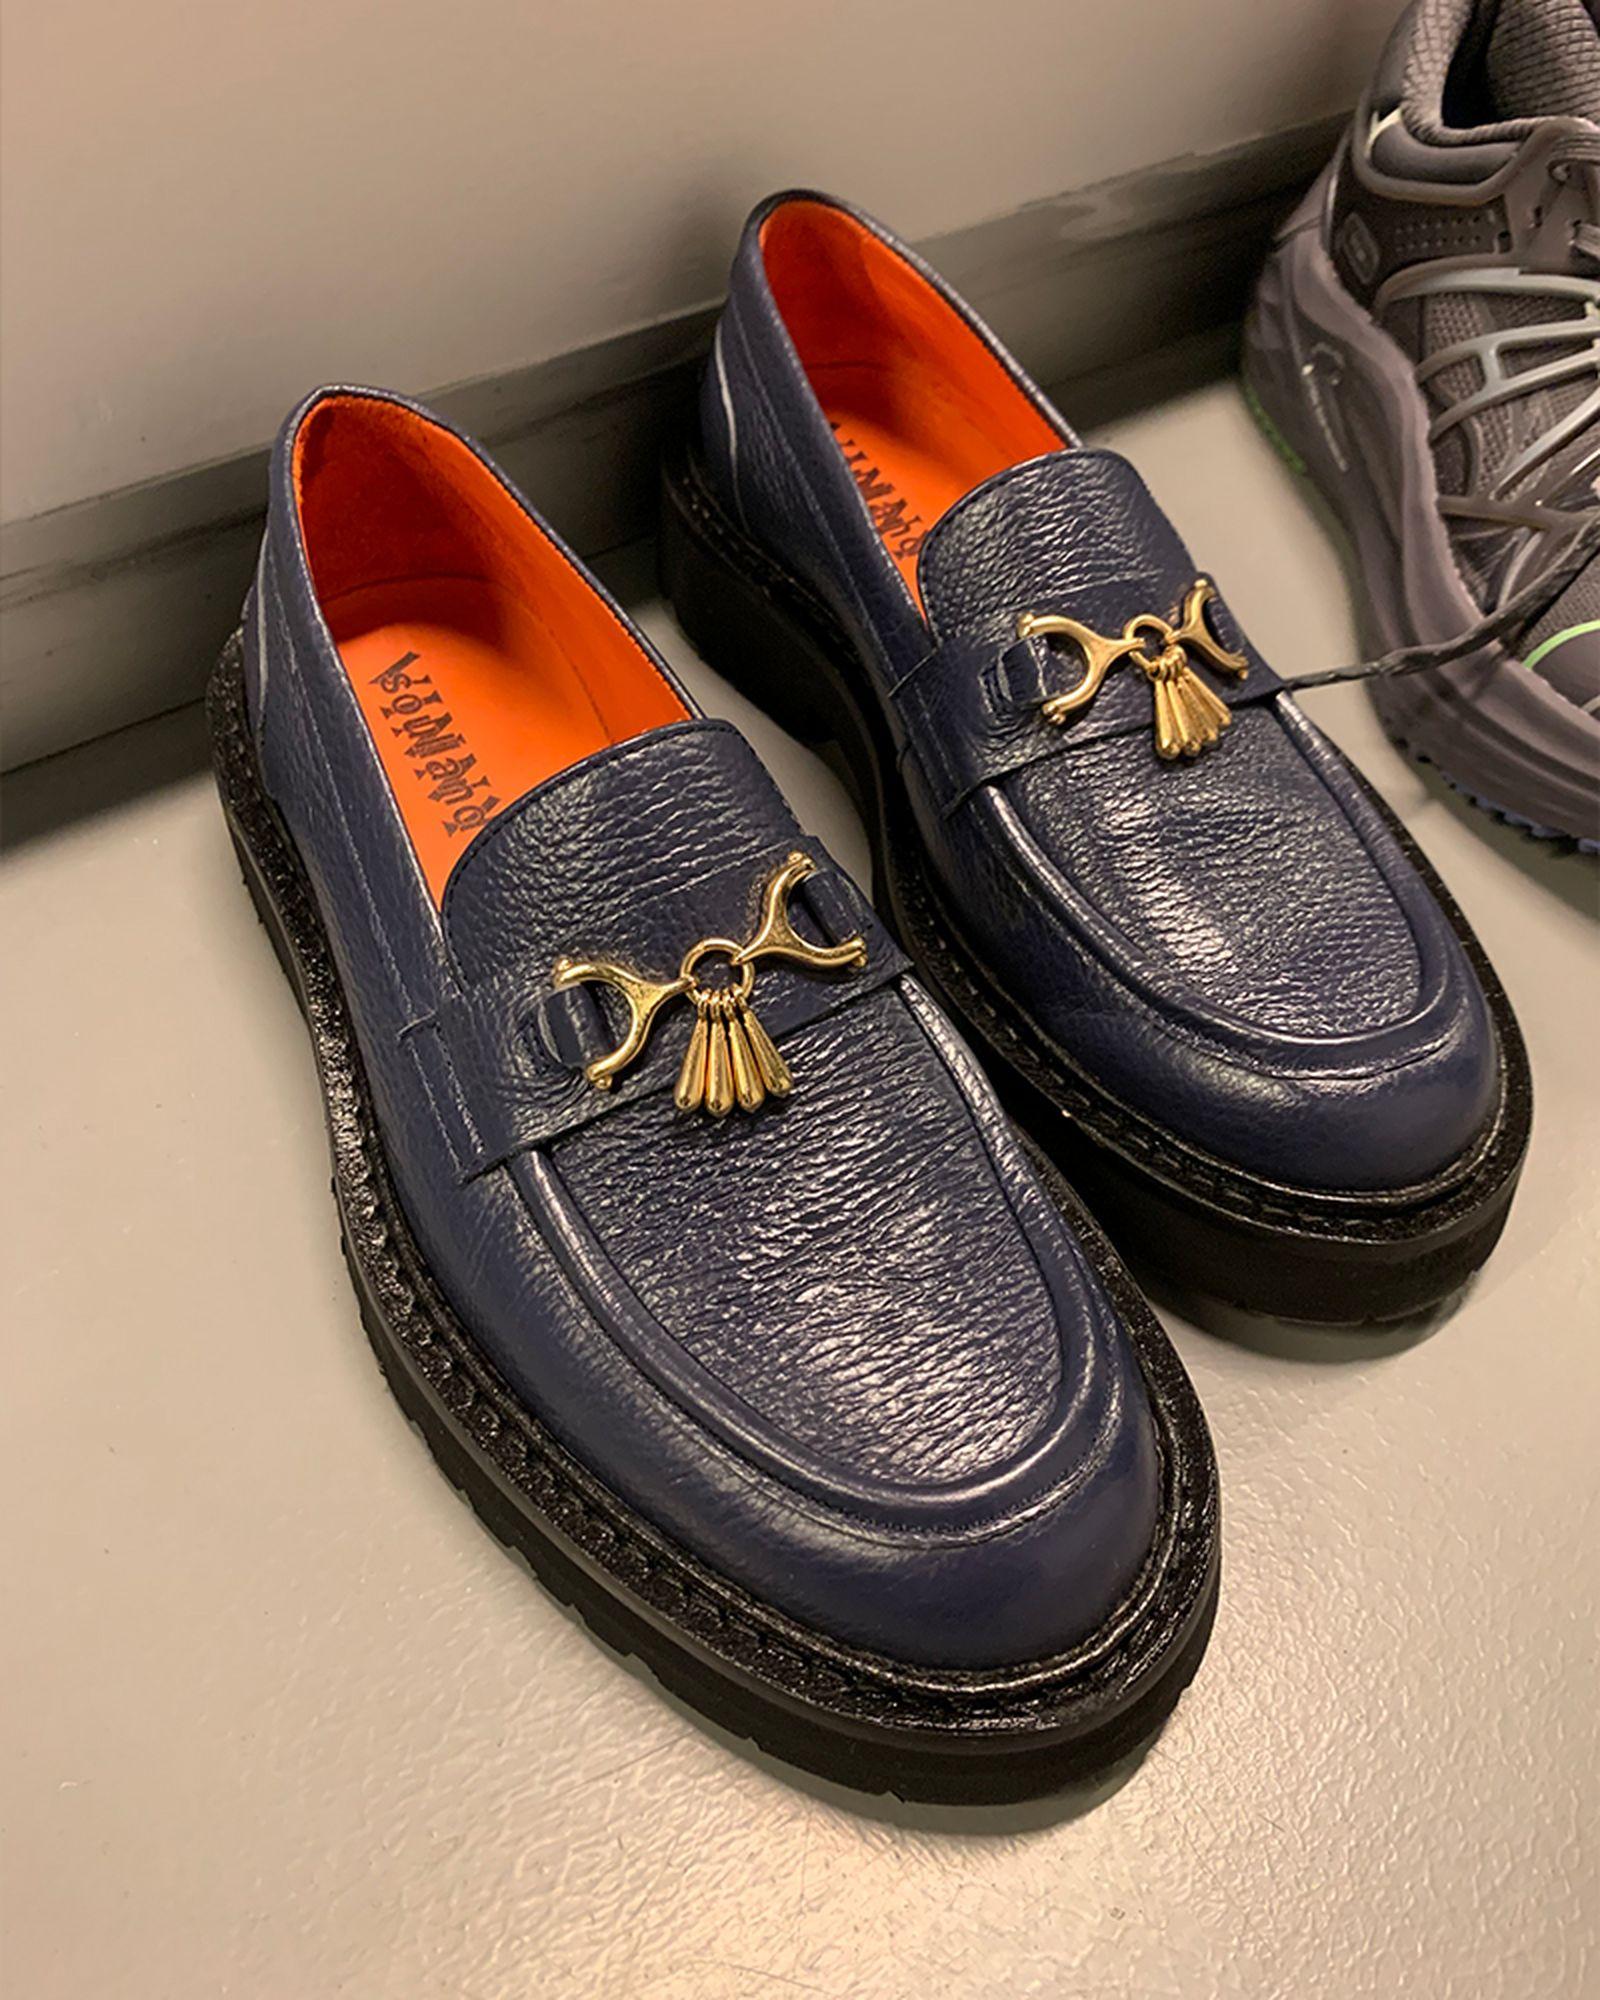 li-ning-soulland-sneakers-04